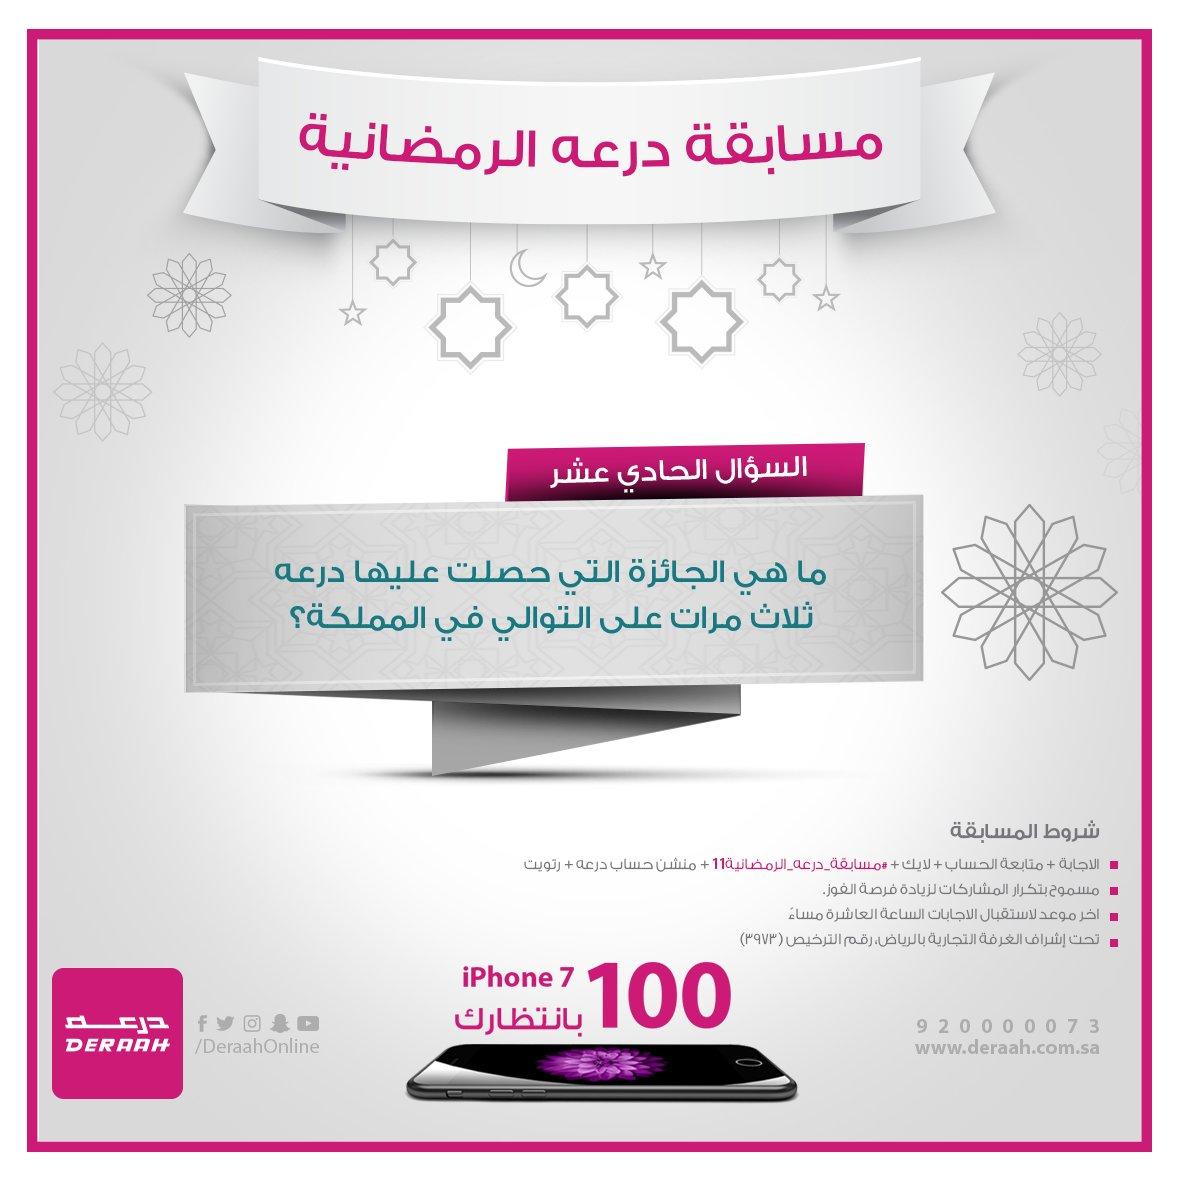 fe10f1012 #مسابقة_درعه_الرمضانيه11pic.twitter.com/2M6JLCbHjV